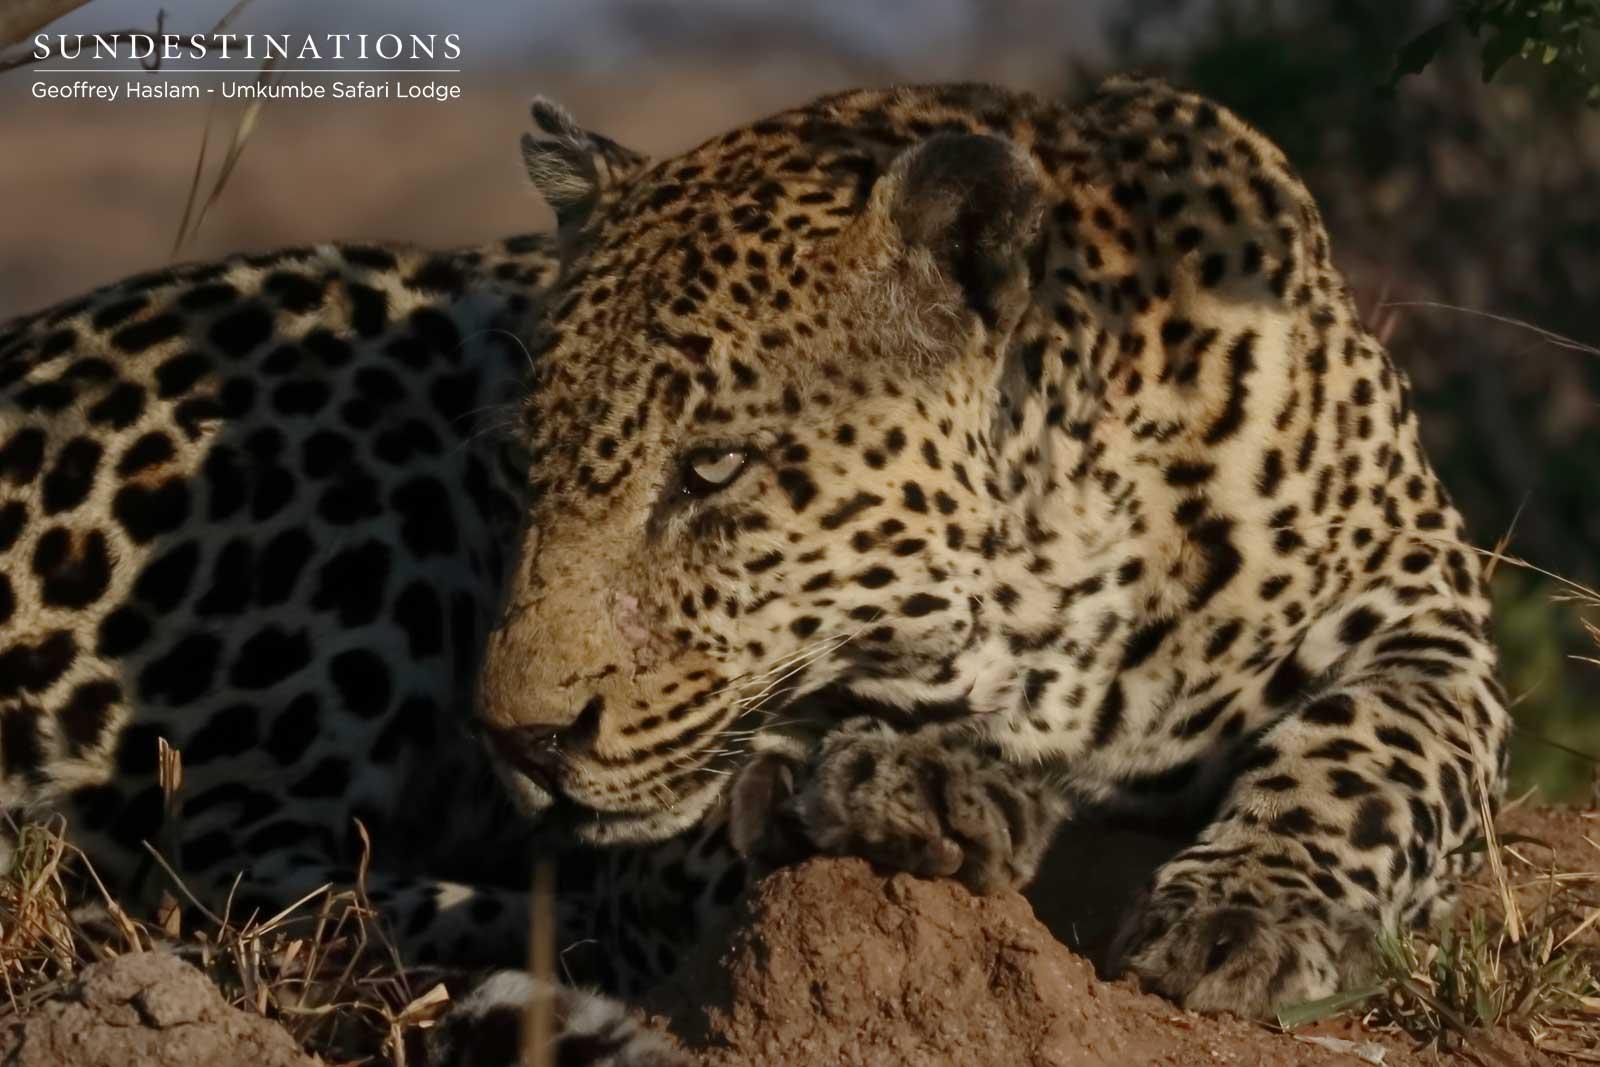 Kashan the Leopard - Umkumbe